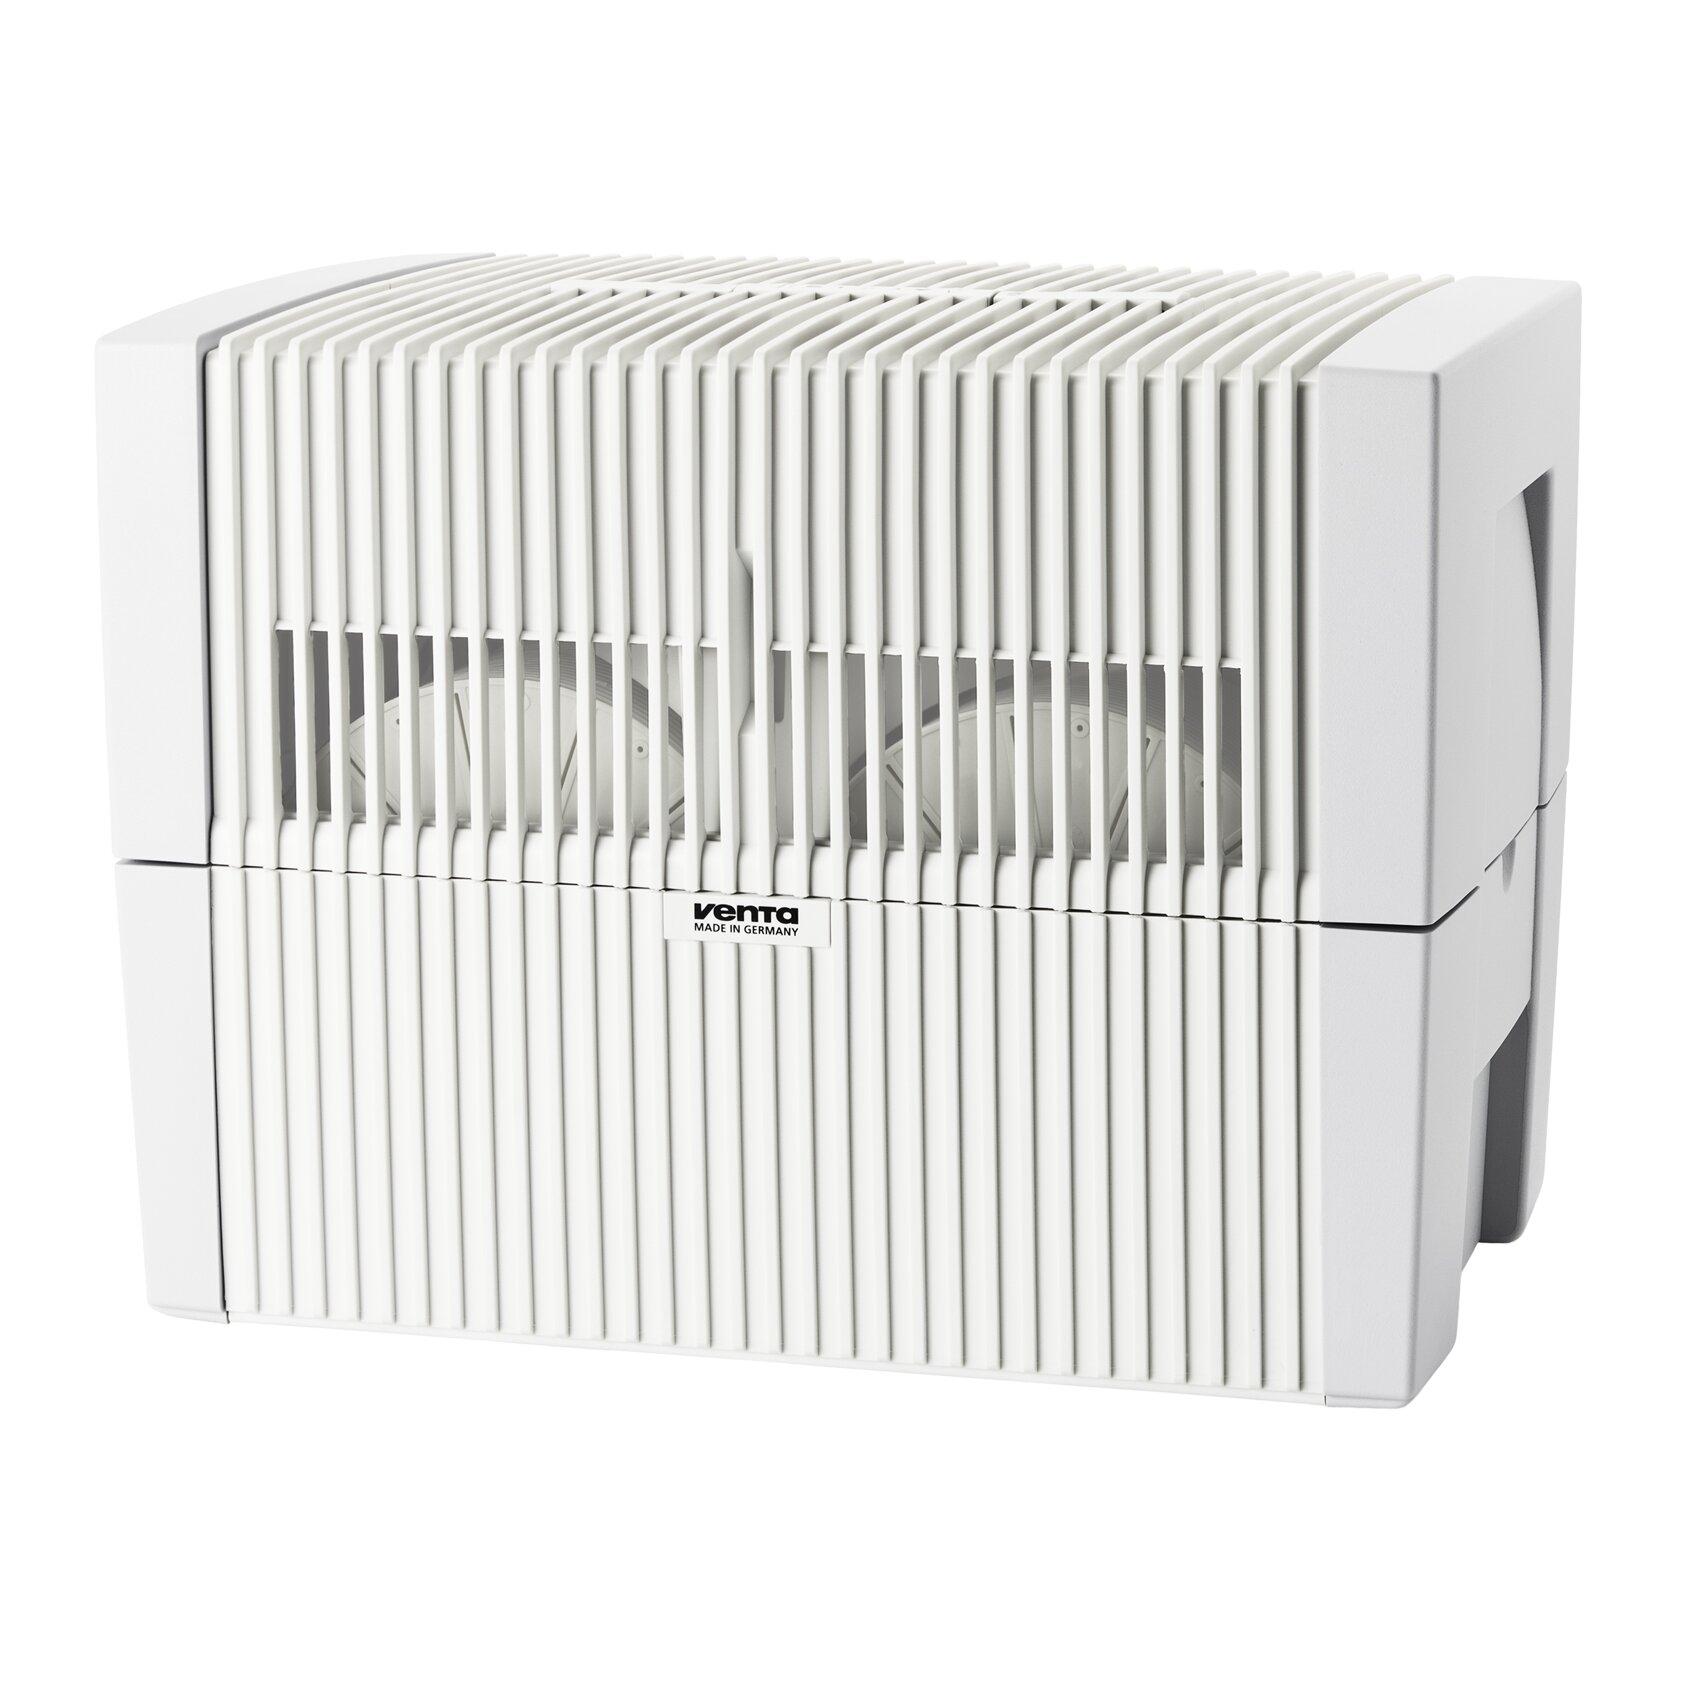 Venta Airwasher 3 Gal. Evaporative Humidifier & Reviews Wayfair #6C6C5F